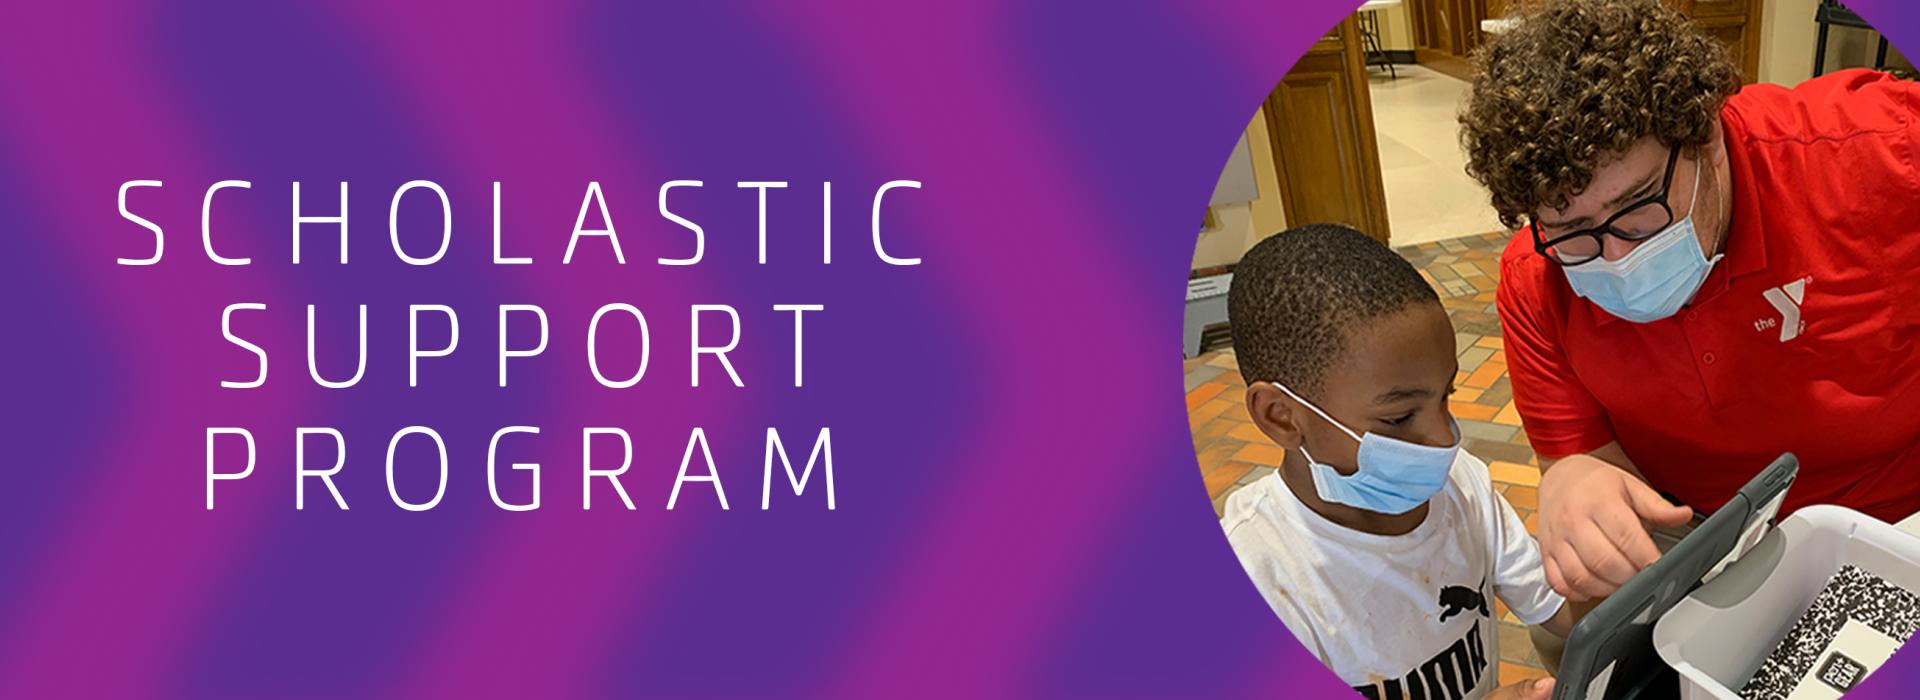 scholastic_support